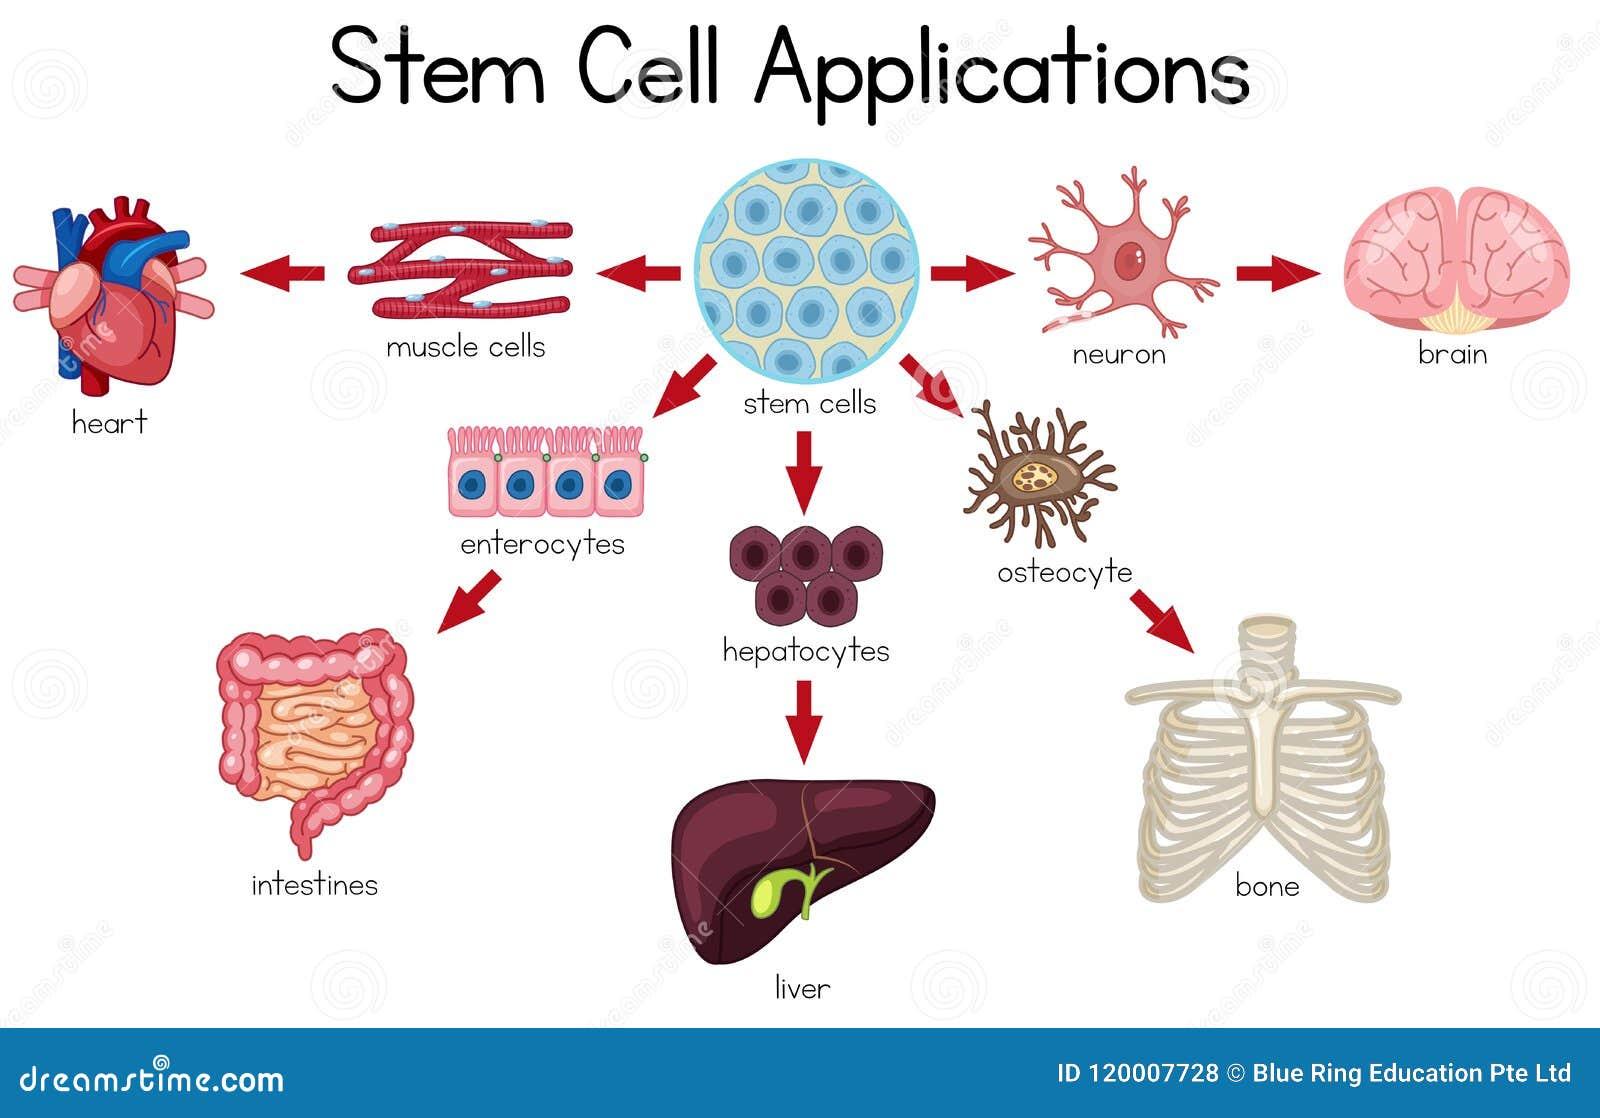 Stem Cell Applications diagram